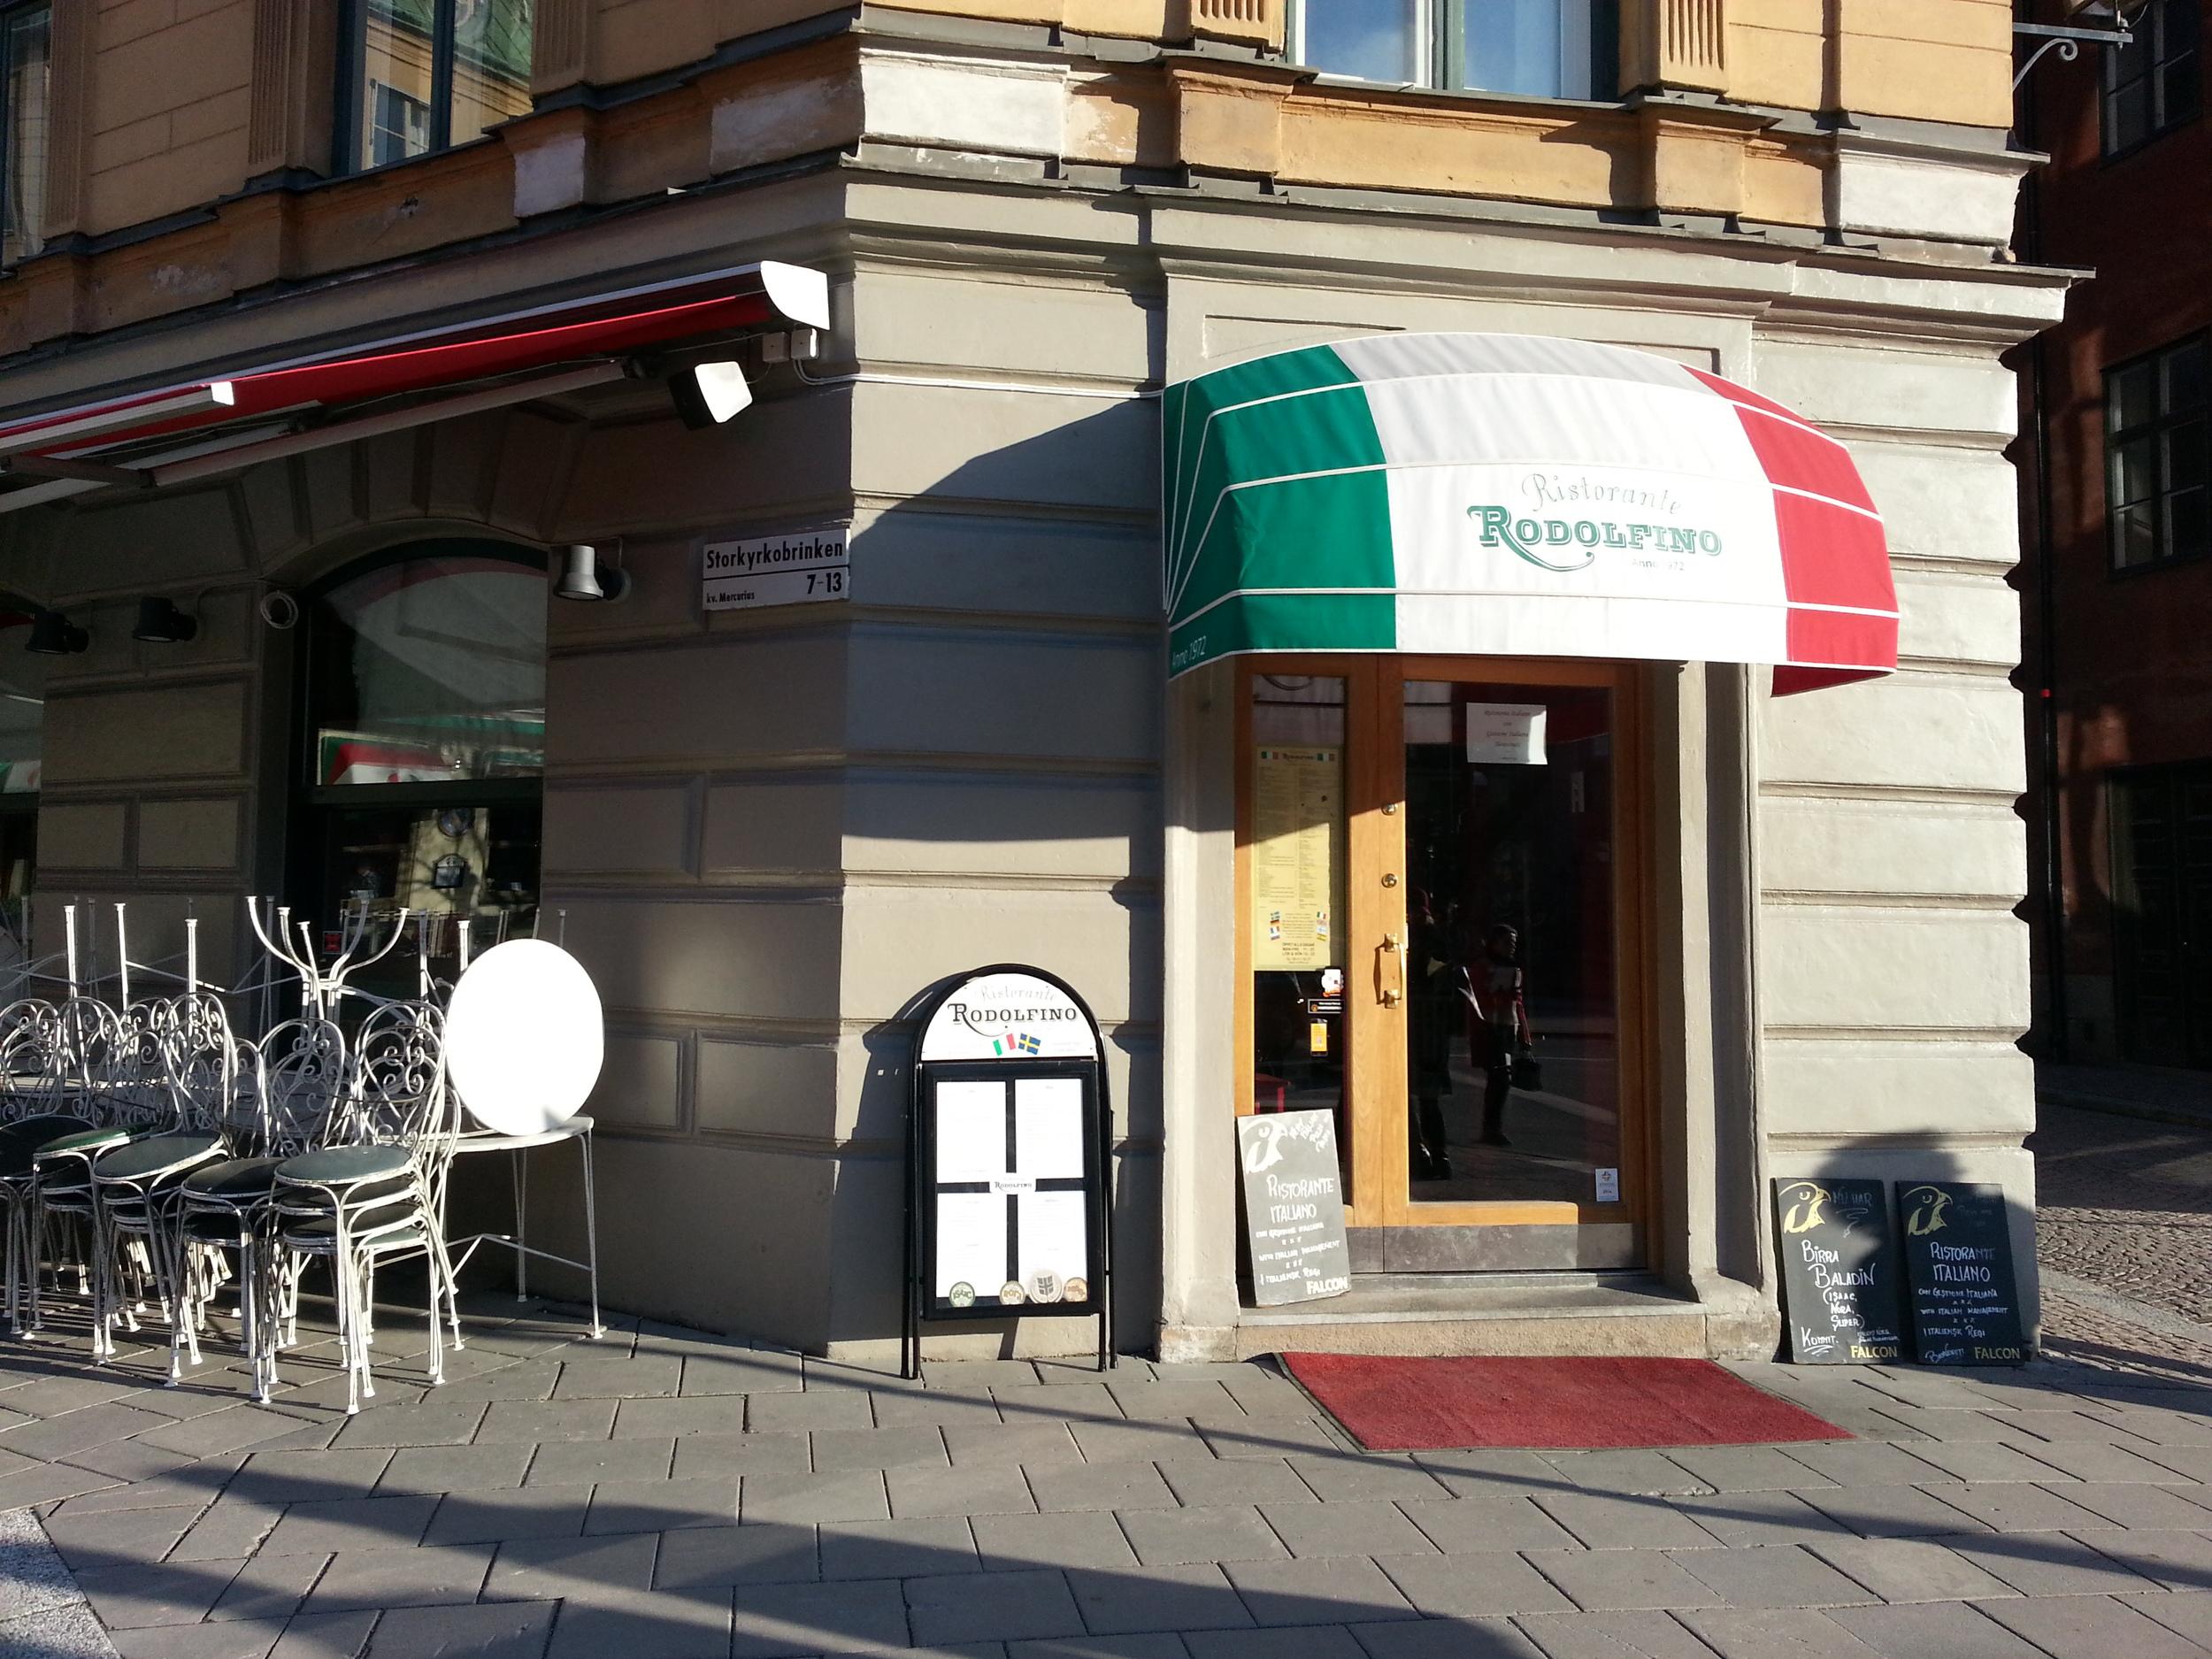 Ristorante Rodolfino, Italian restaurant in Gamla Stan with fantastic food!